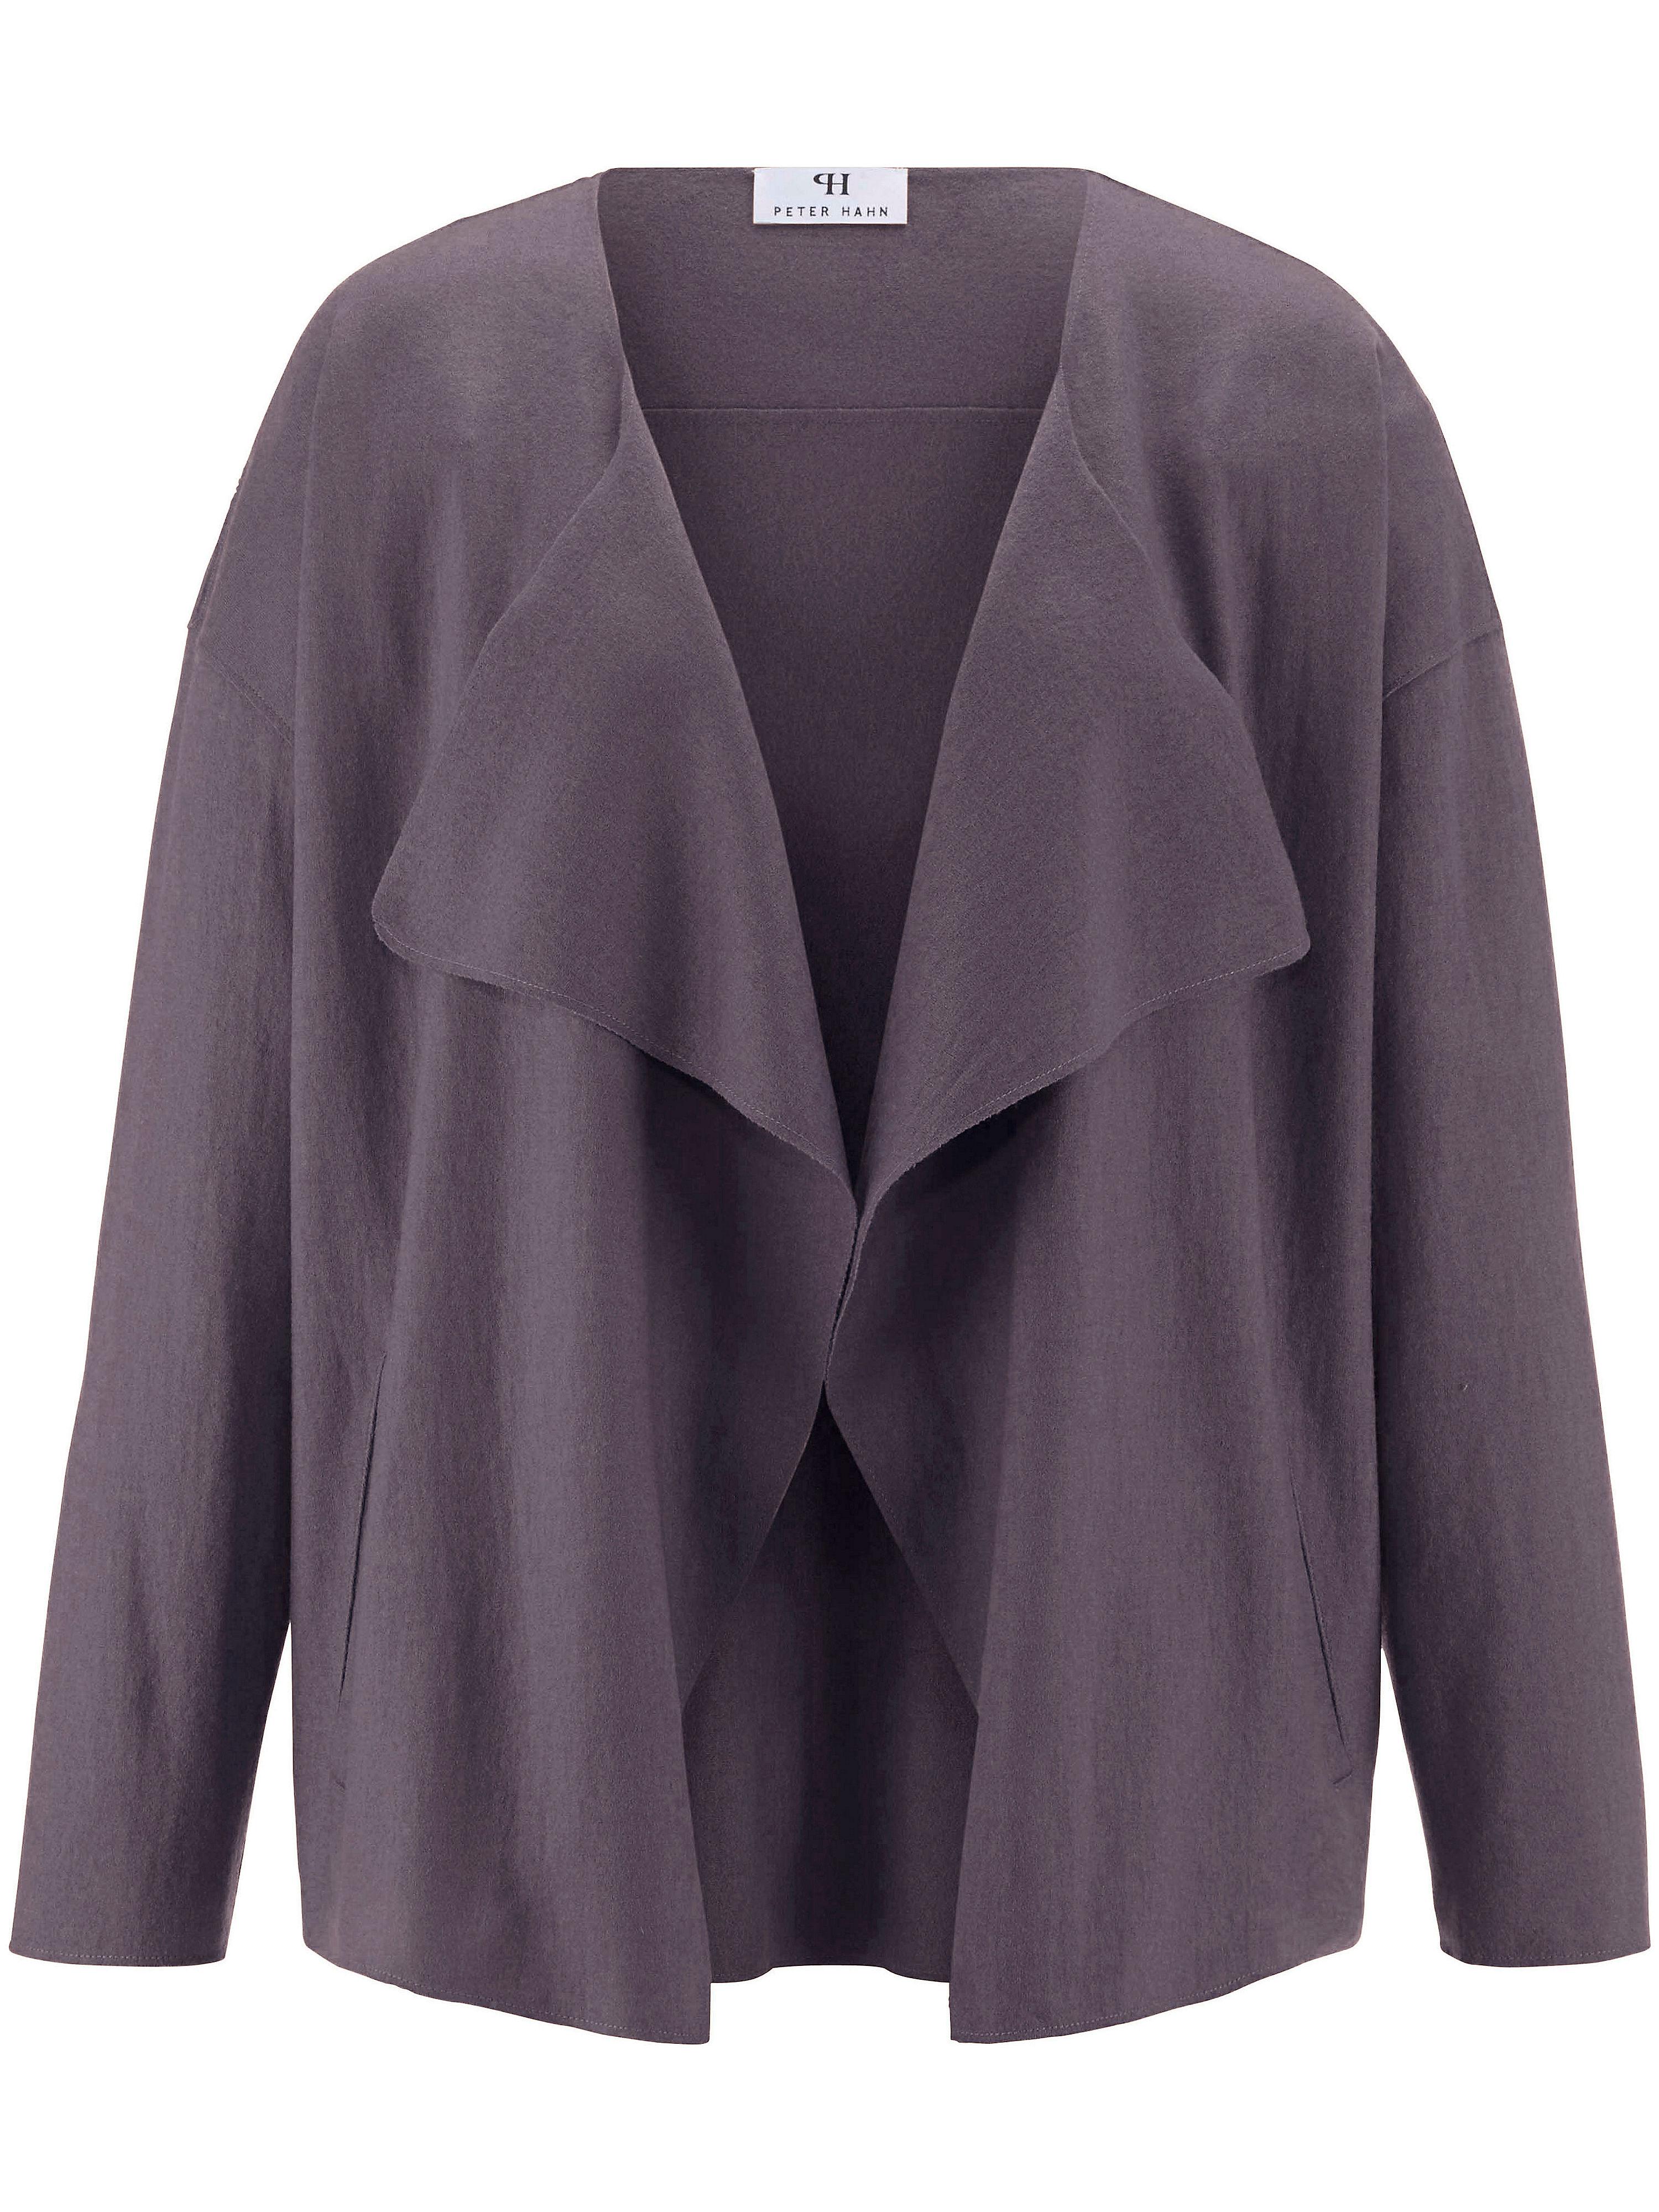 Image of   Jakke 100% ren ny uld Fra Peter Hahn lilla